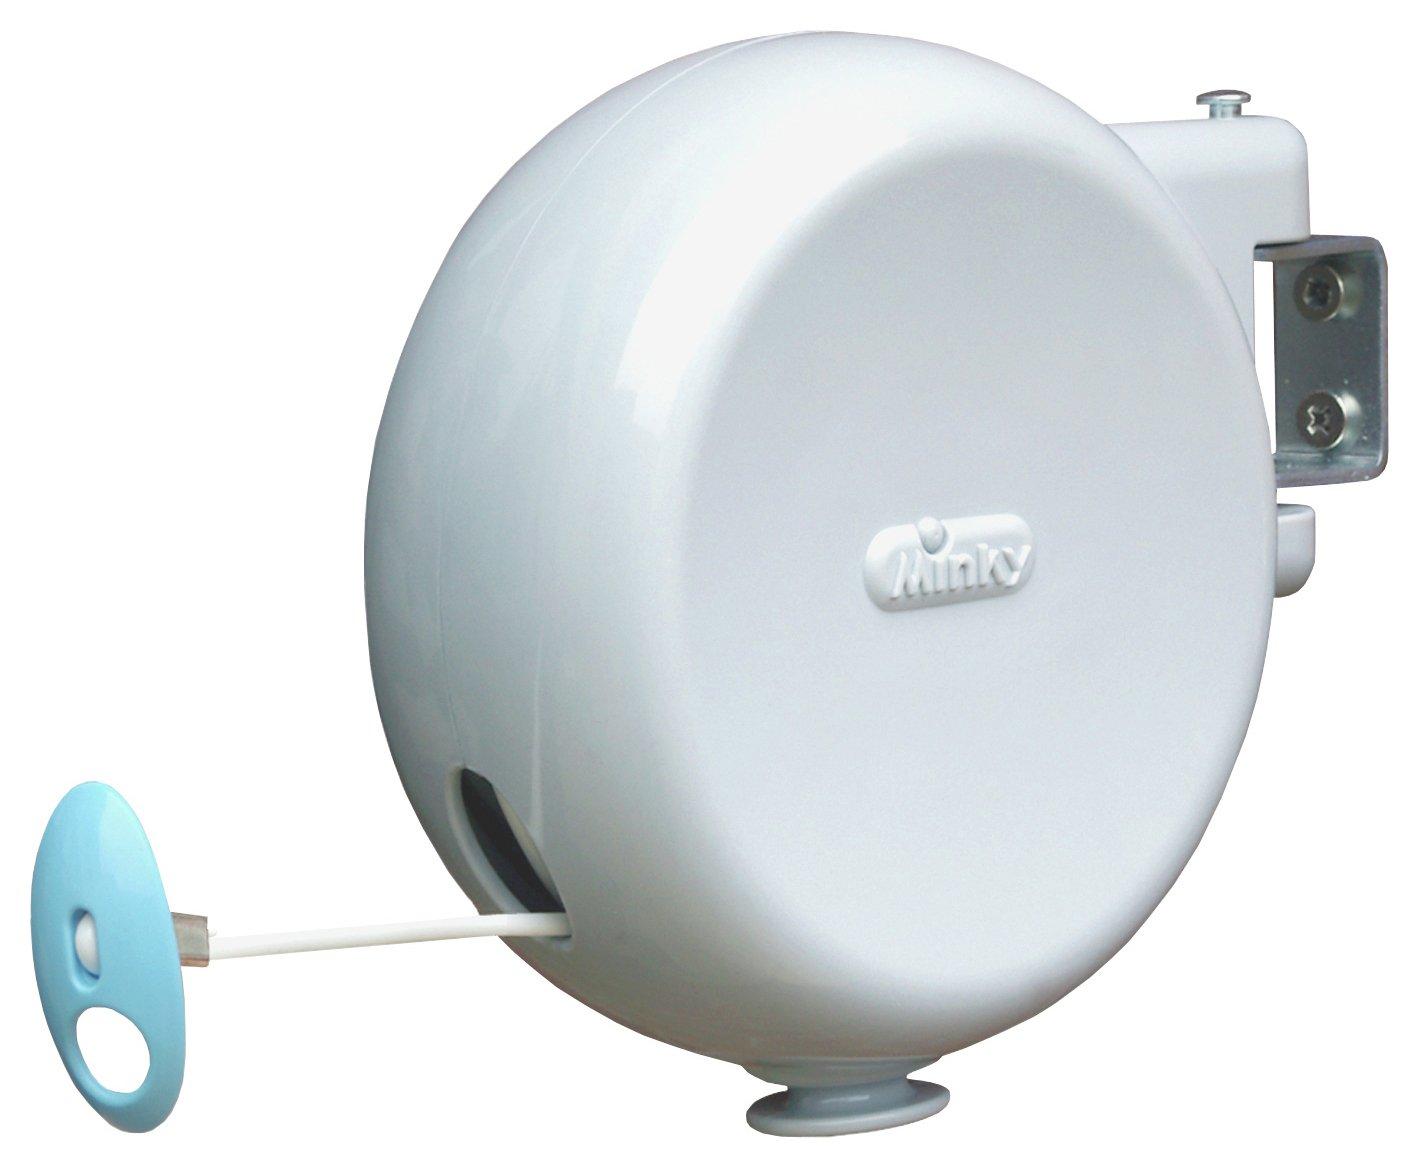 Minky 15m Retractable Reel Outdoor Washing Line